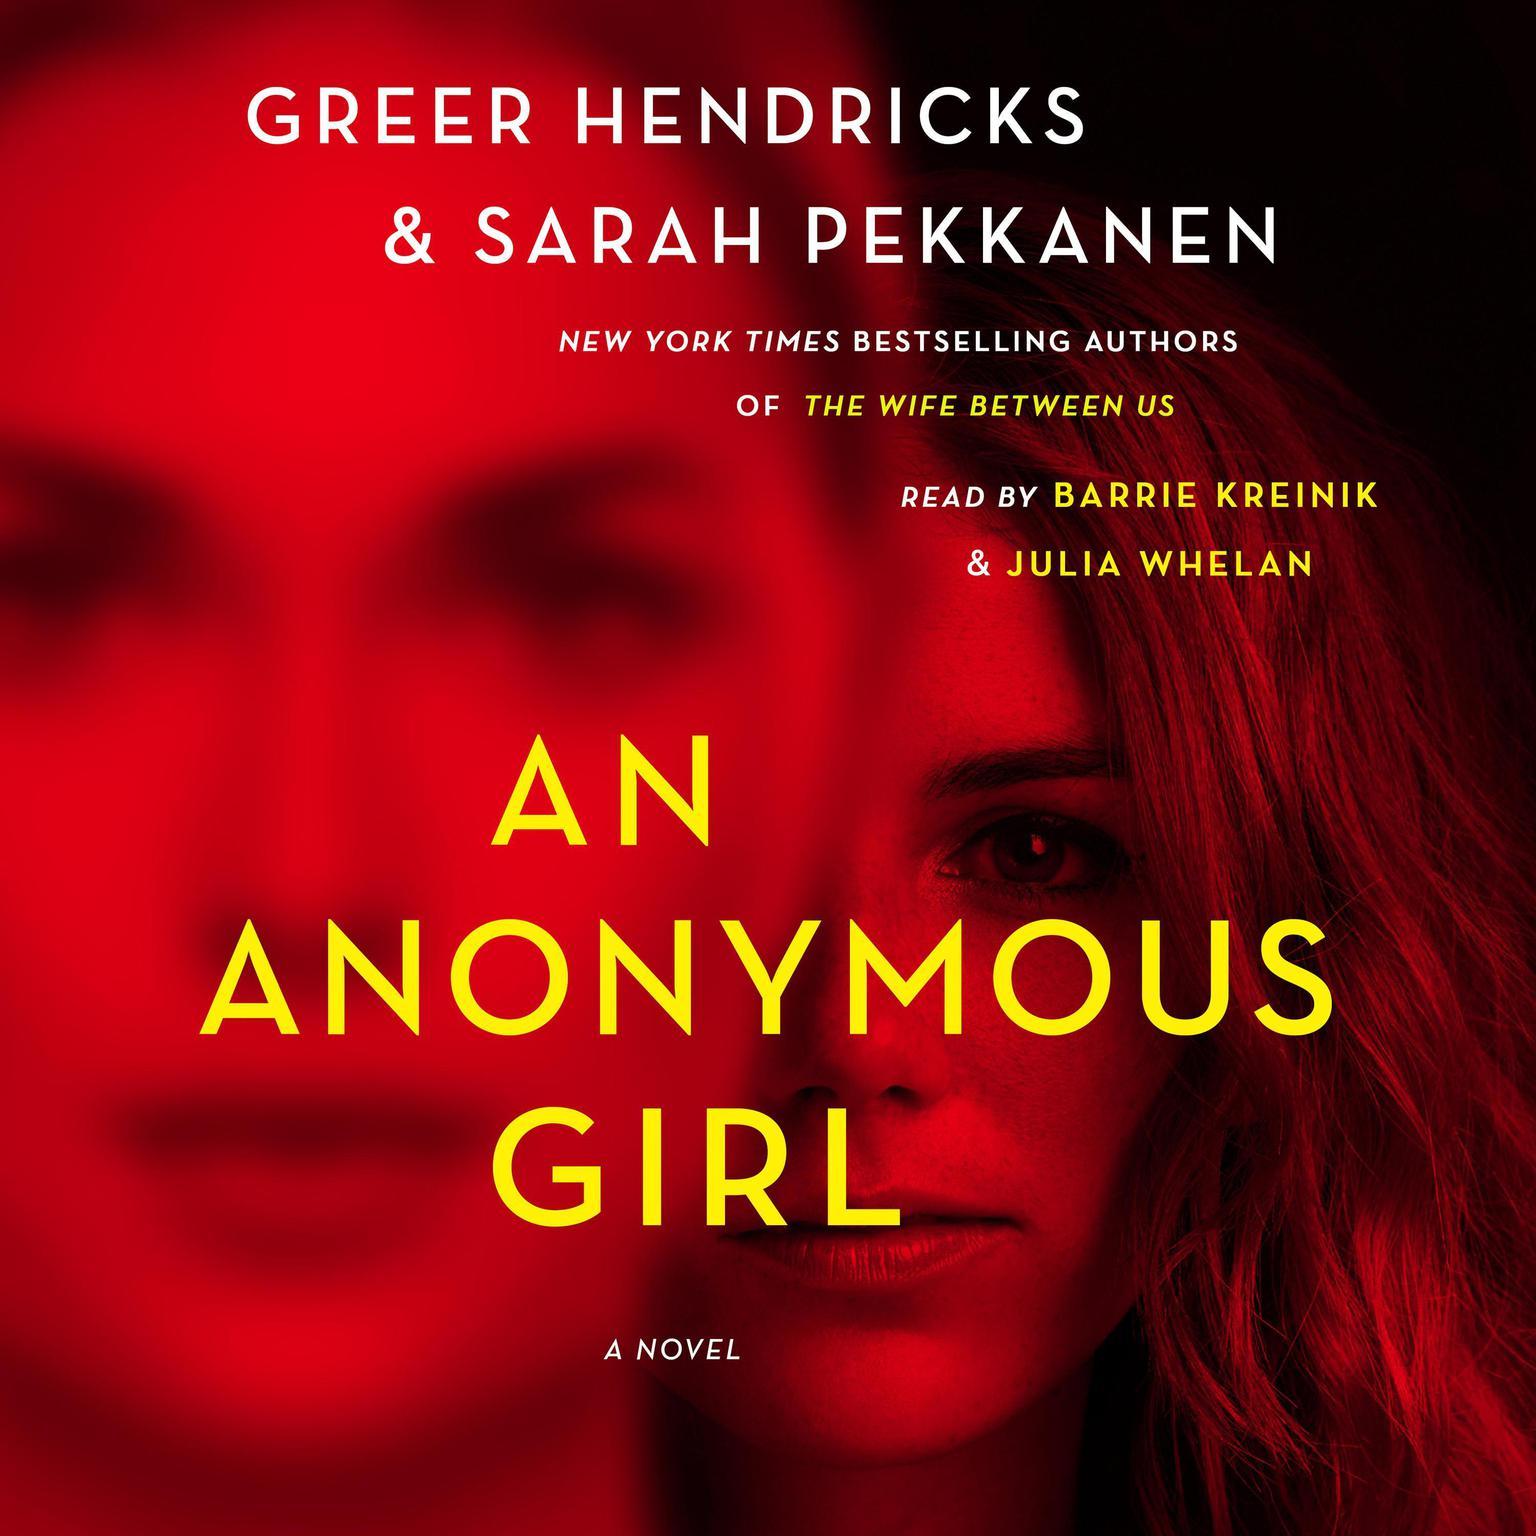 Printable An Anonymous Girl: A Novel Audiobook Cover Art